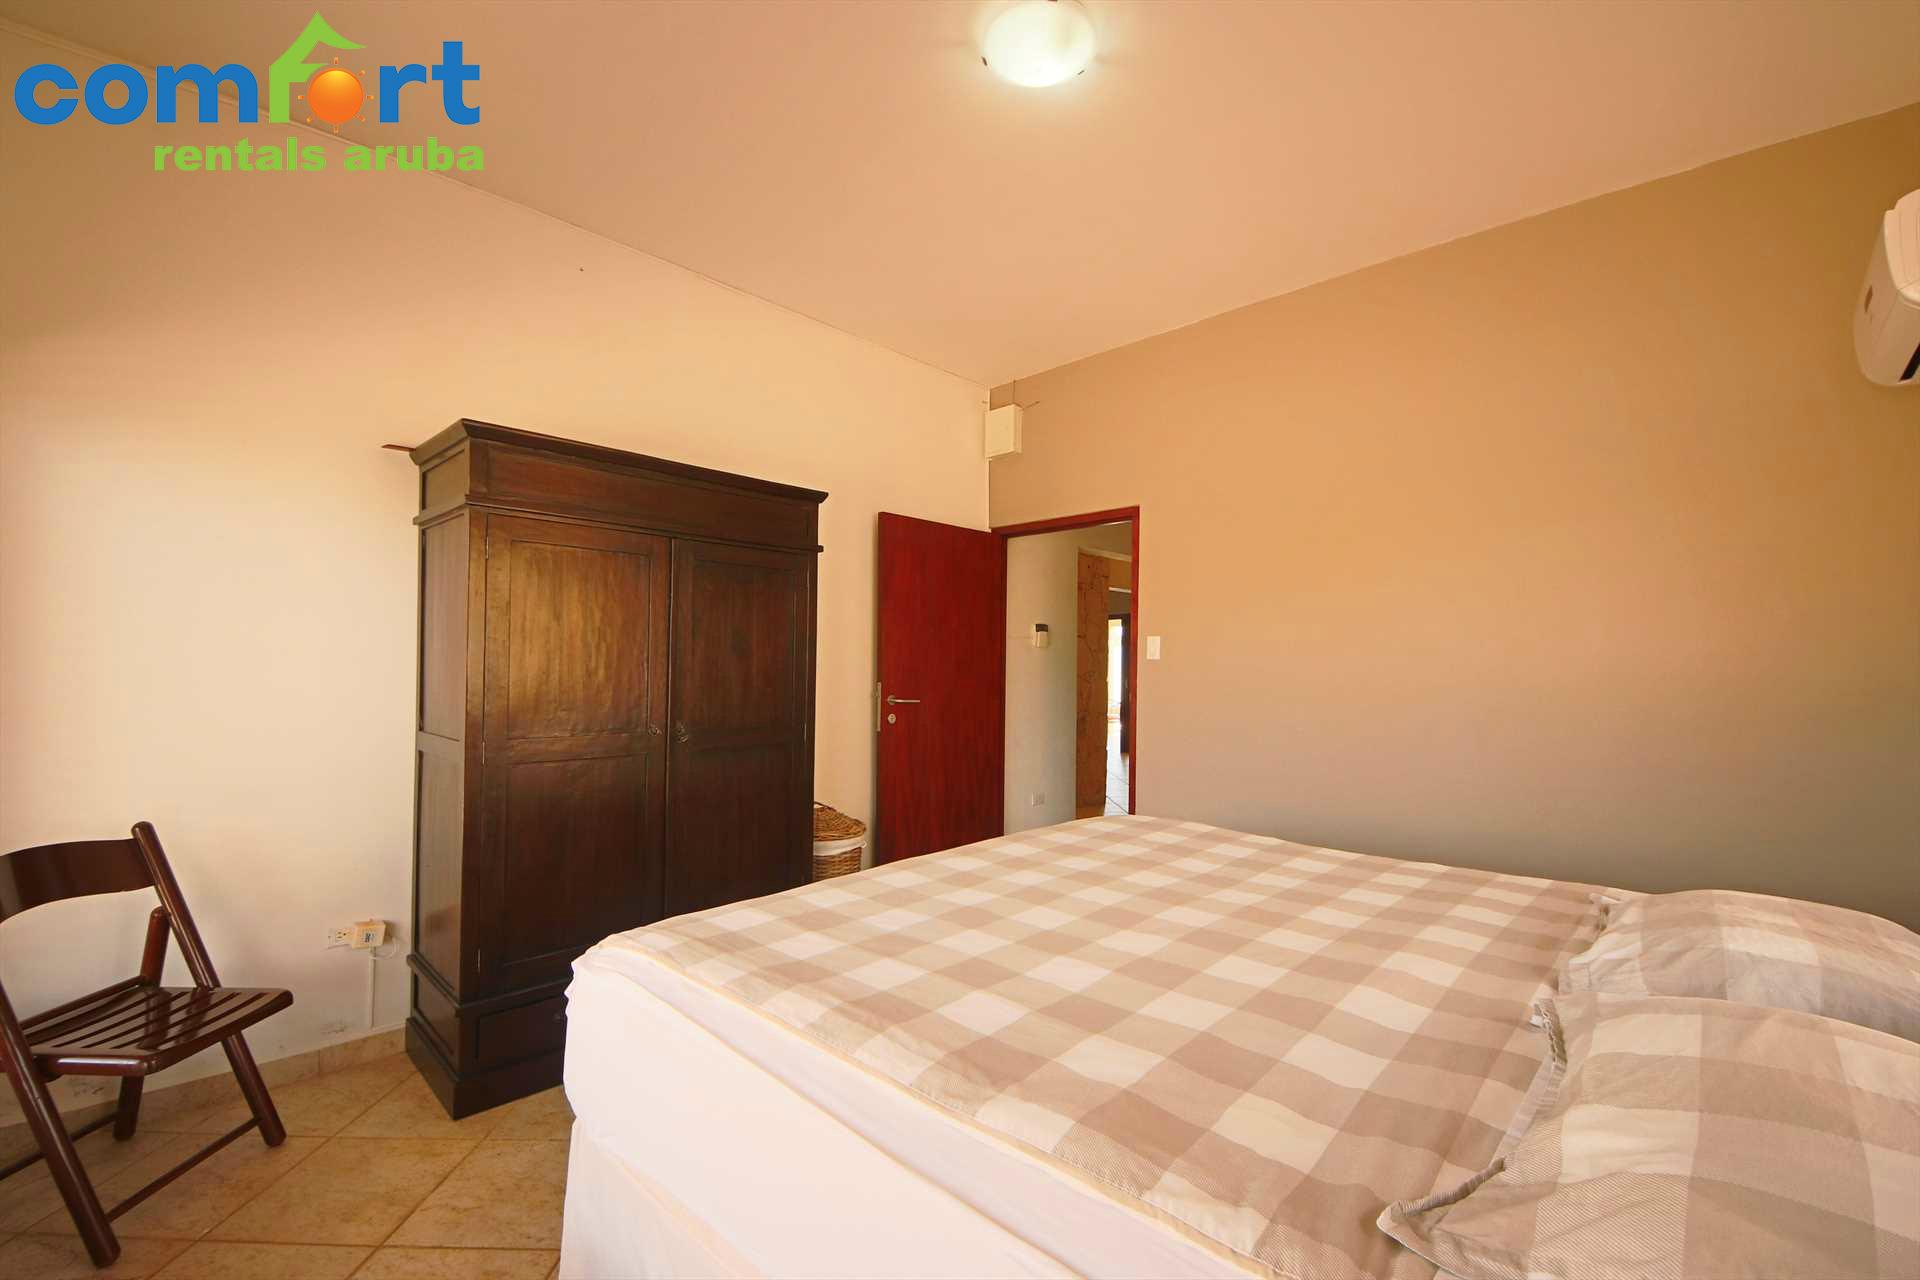 Opal Jewel Four-bedroom villa - OJ88 - Comfort Rentals ...